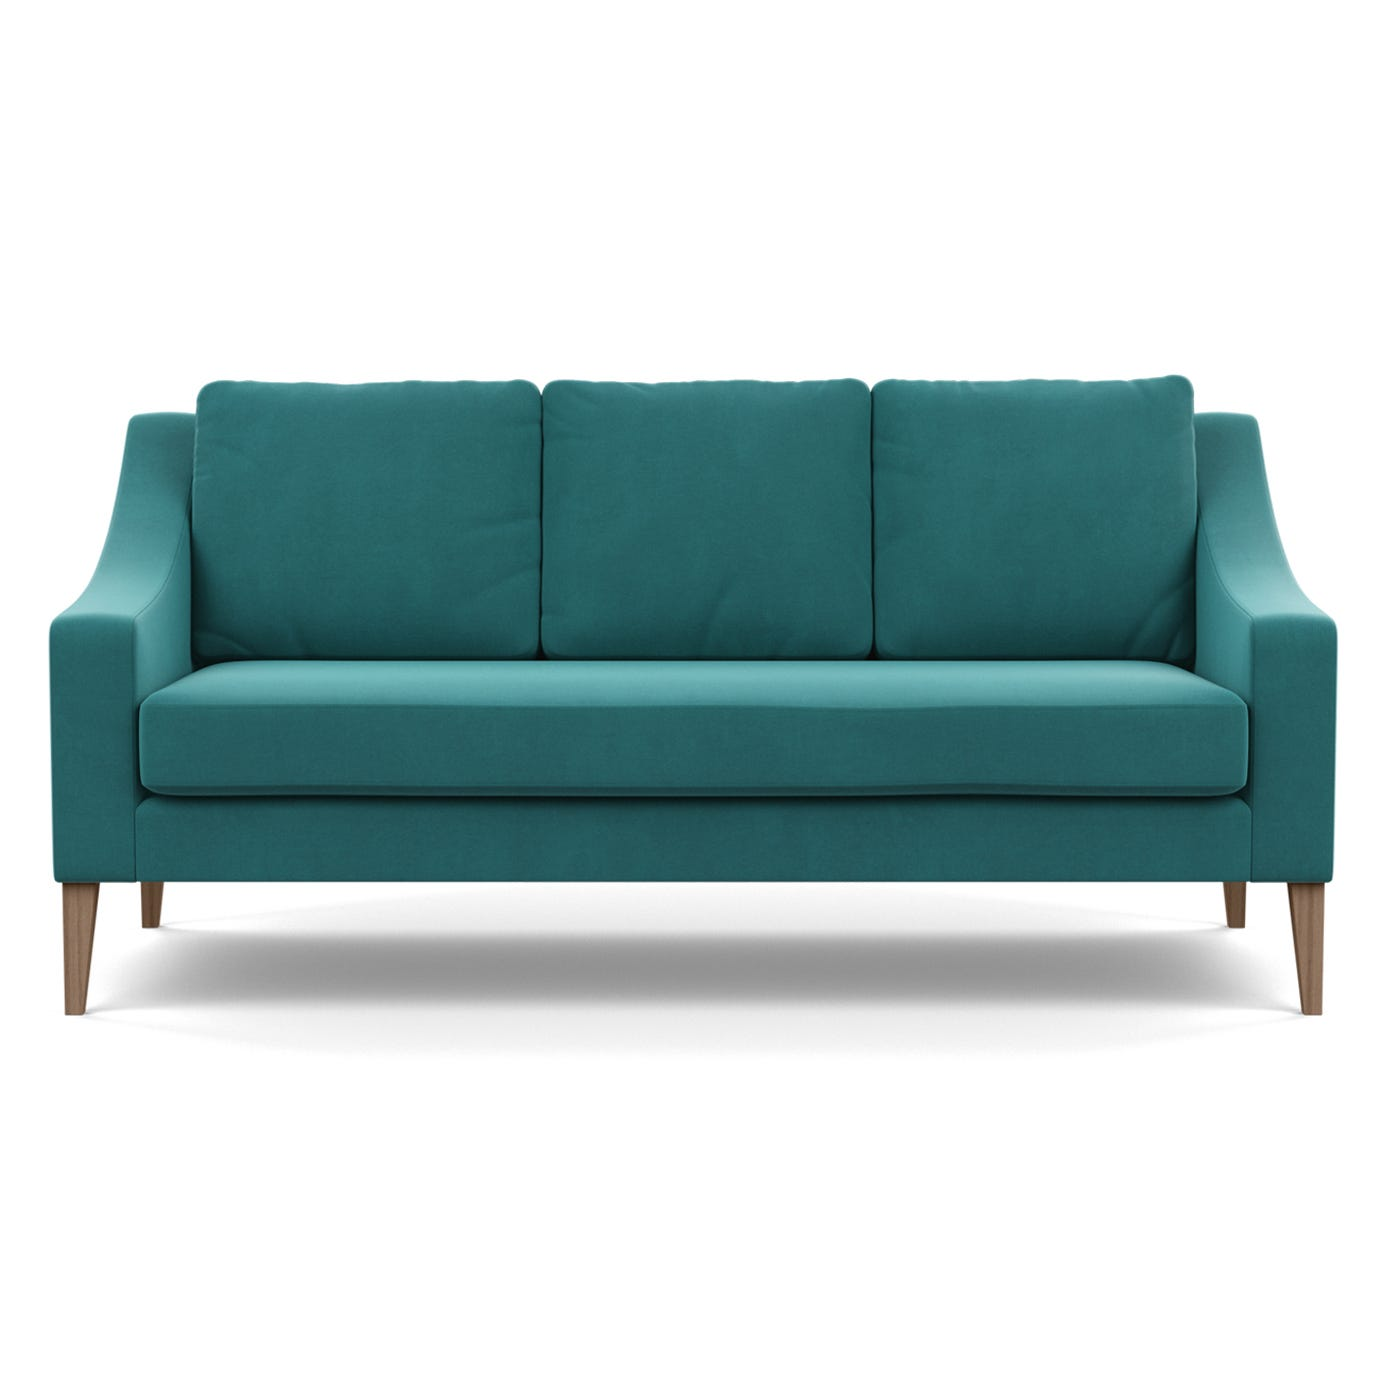 Richmond 3 Seater Sofa